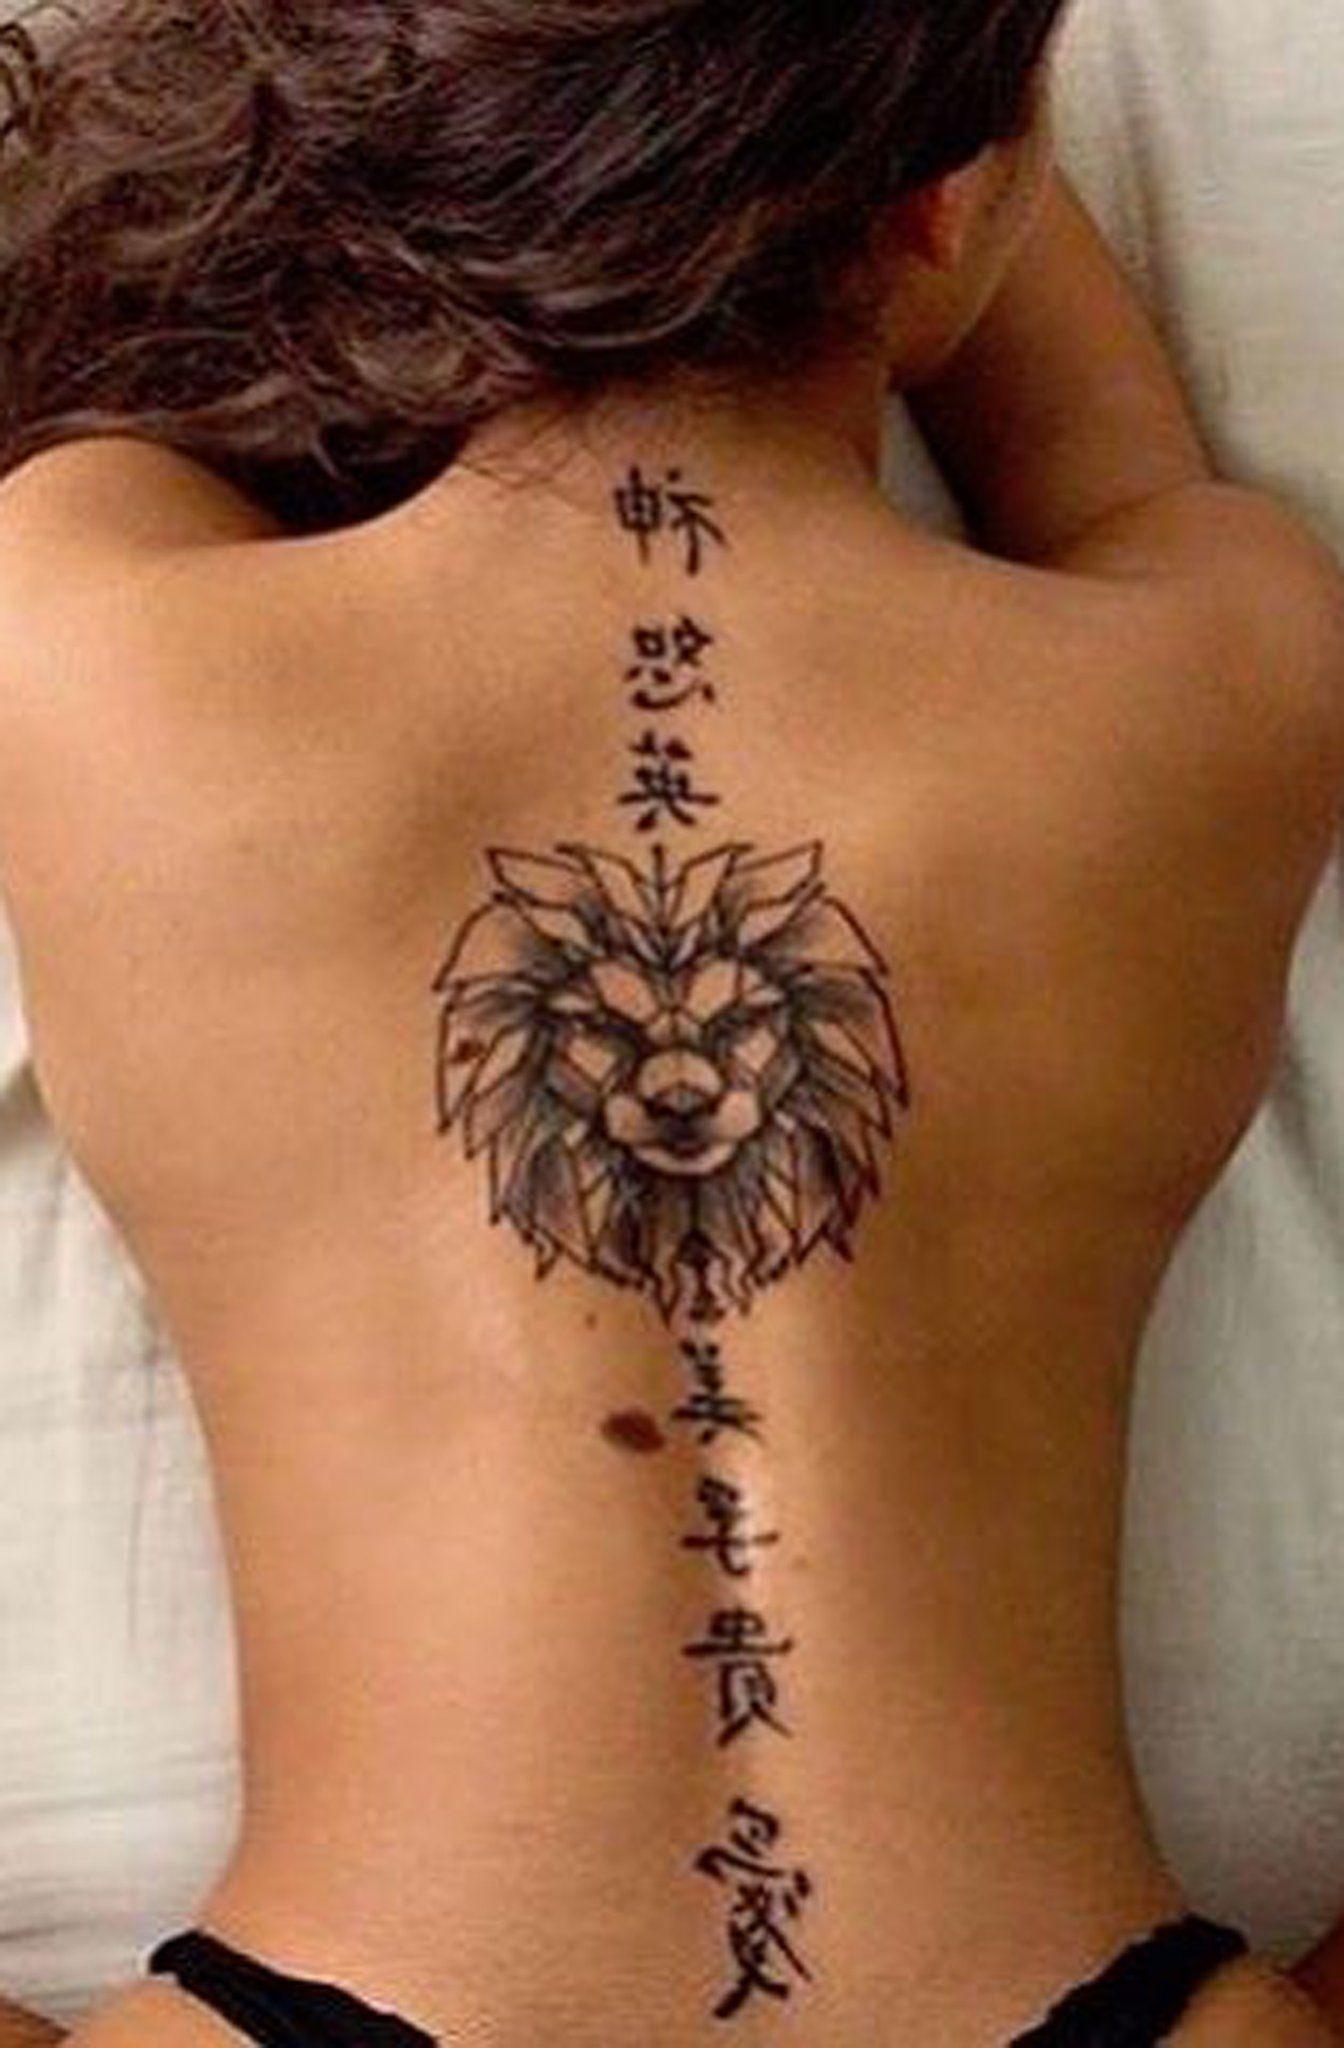 Chinese Japanese Kanji Characters Spine Tat Geometric Lion Back Tattoo Ideas Escribir Ideas De Ta Spine Tattoos For Women Spine Tattoos Girl Spine Tattoos